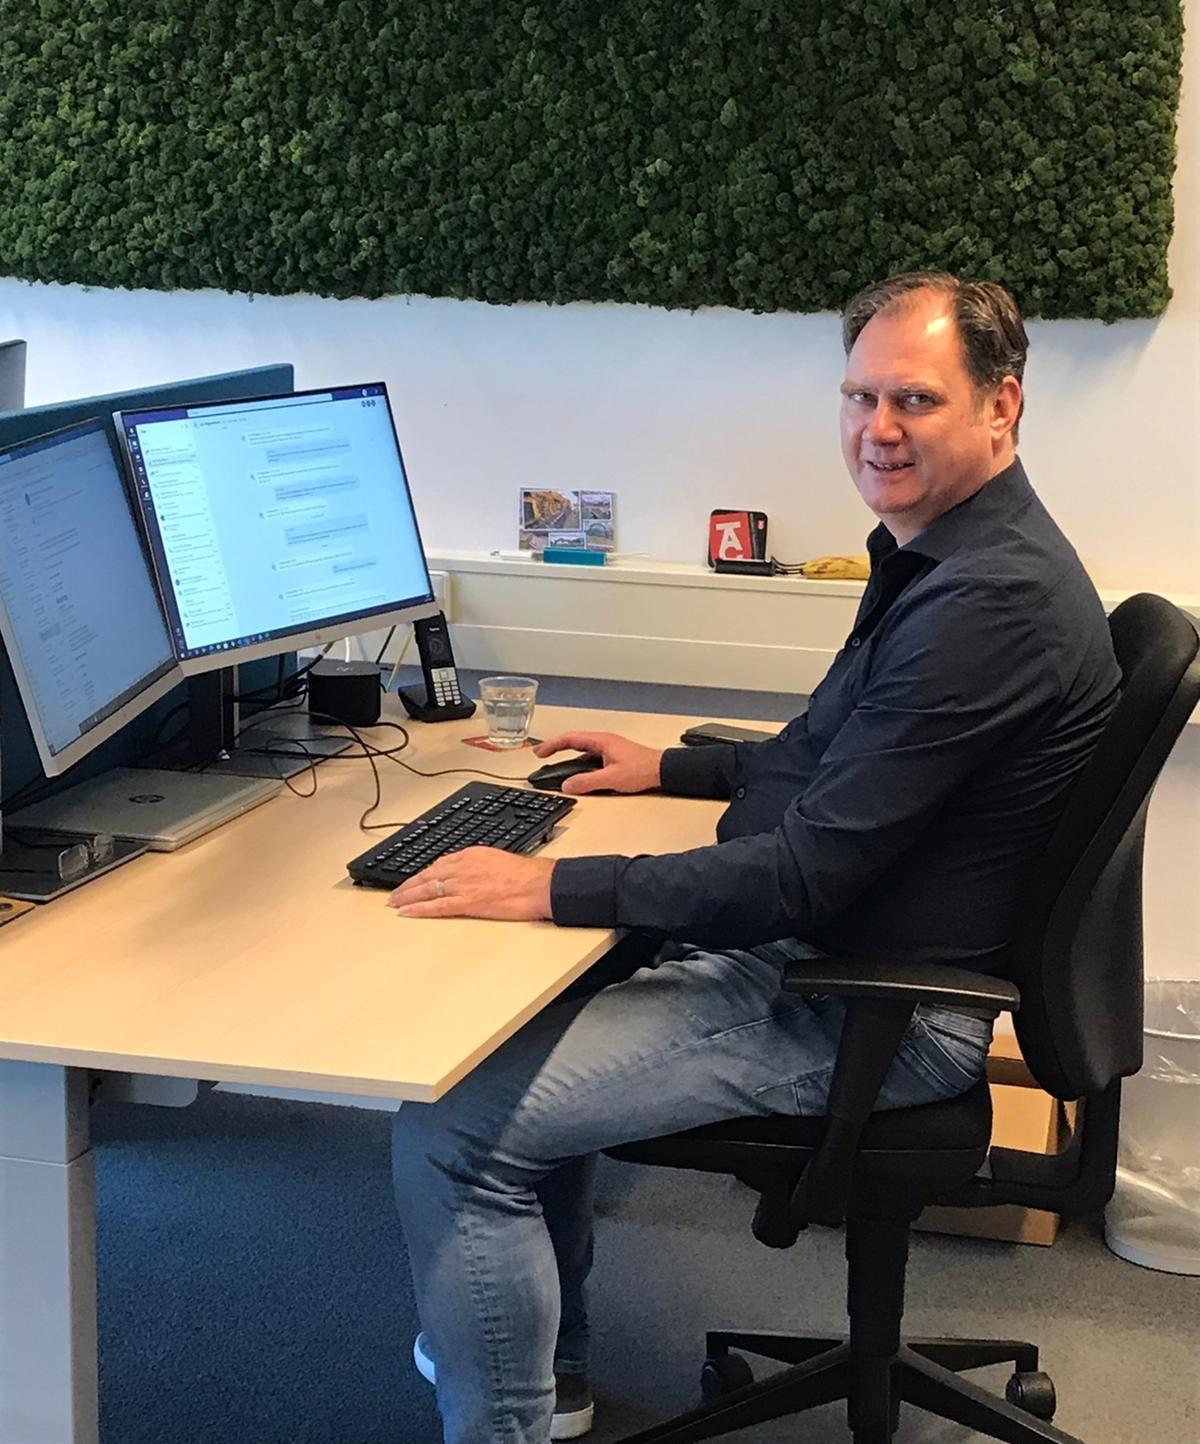 Jeroen Verbaten - The Accounting Company, TAC | Fourtop ICT klantcase